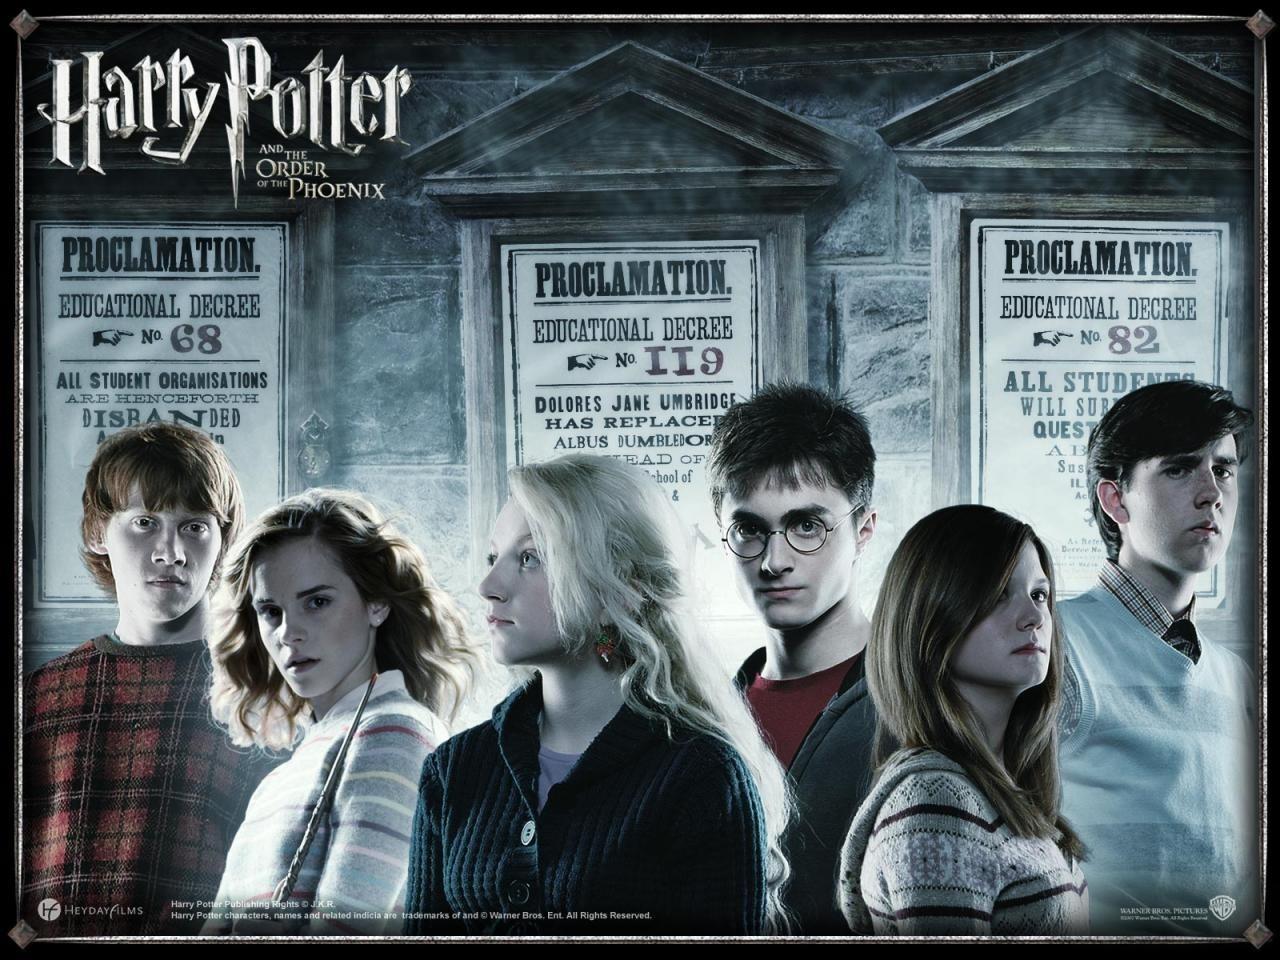 Wonderful Wallpaper Harry Potter Christmas - Harry-Potter-the-Order-Phoenix-wallpaper  Image_503235.jpg